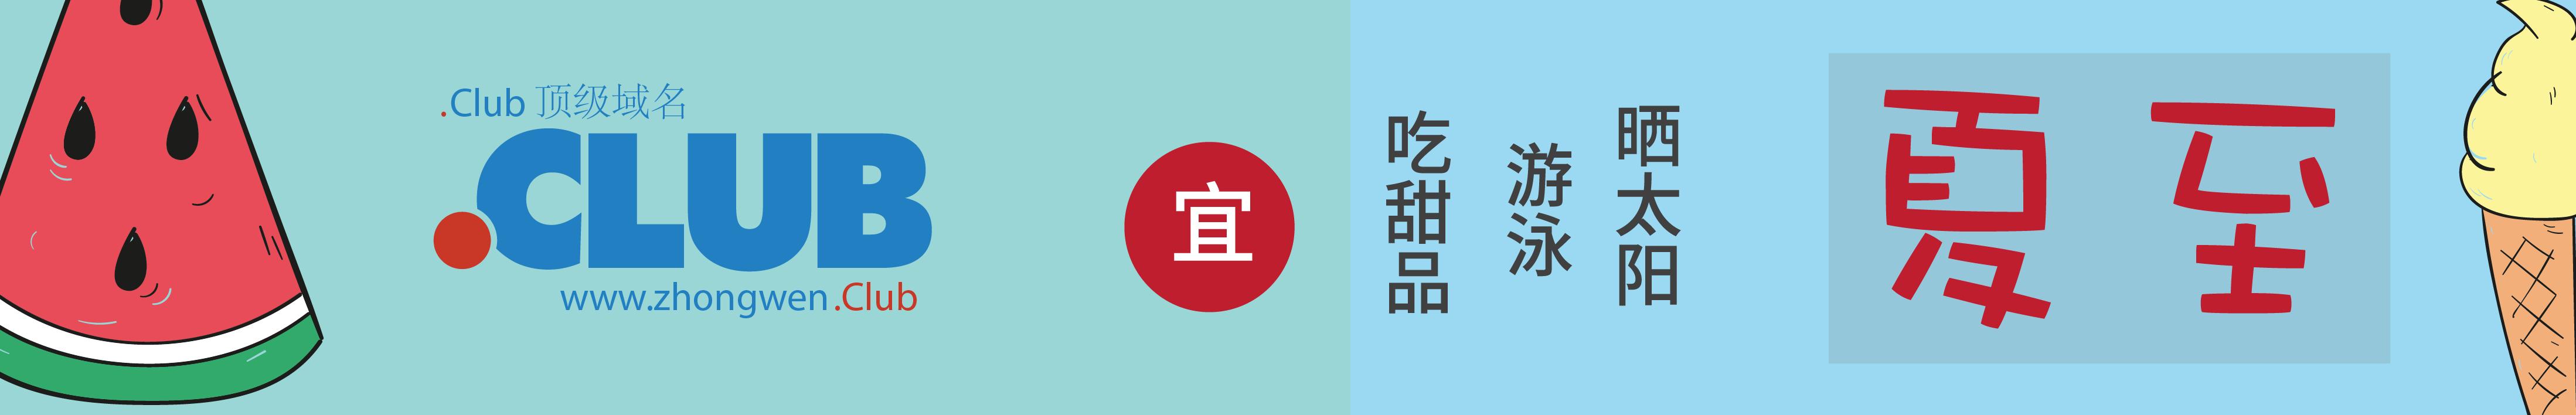 CLUB顶级域名 banner